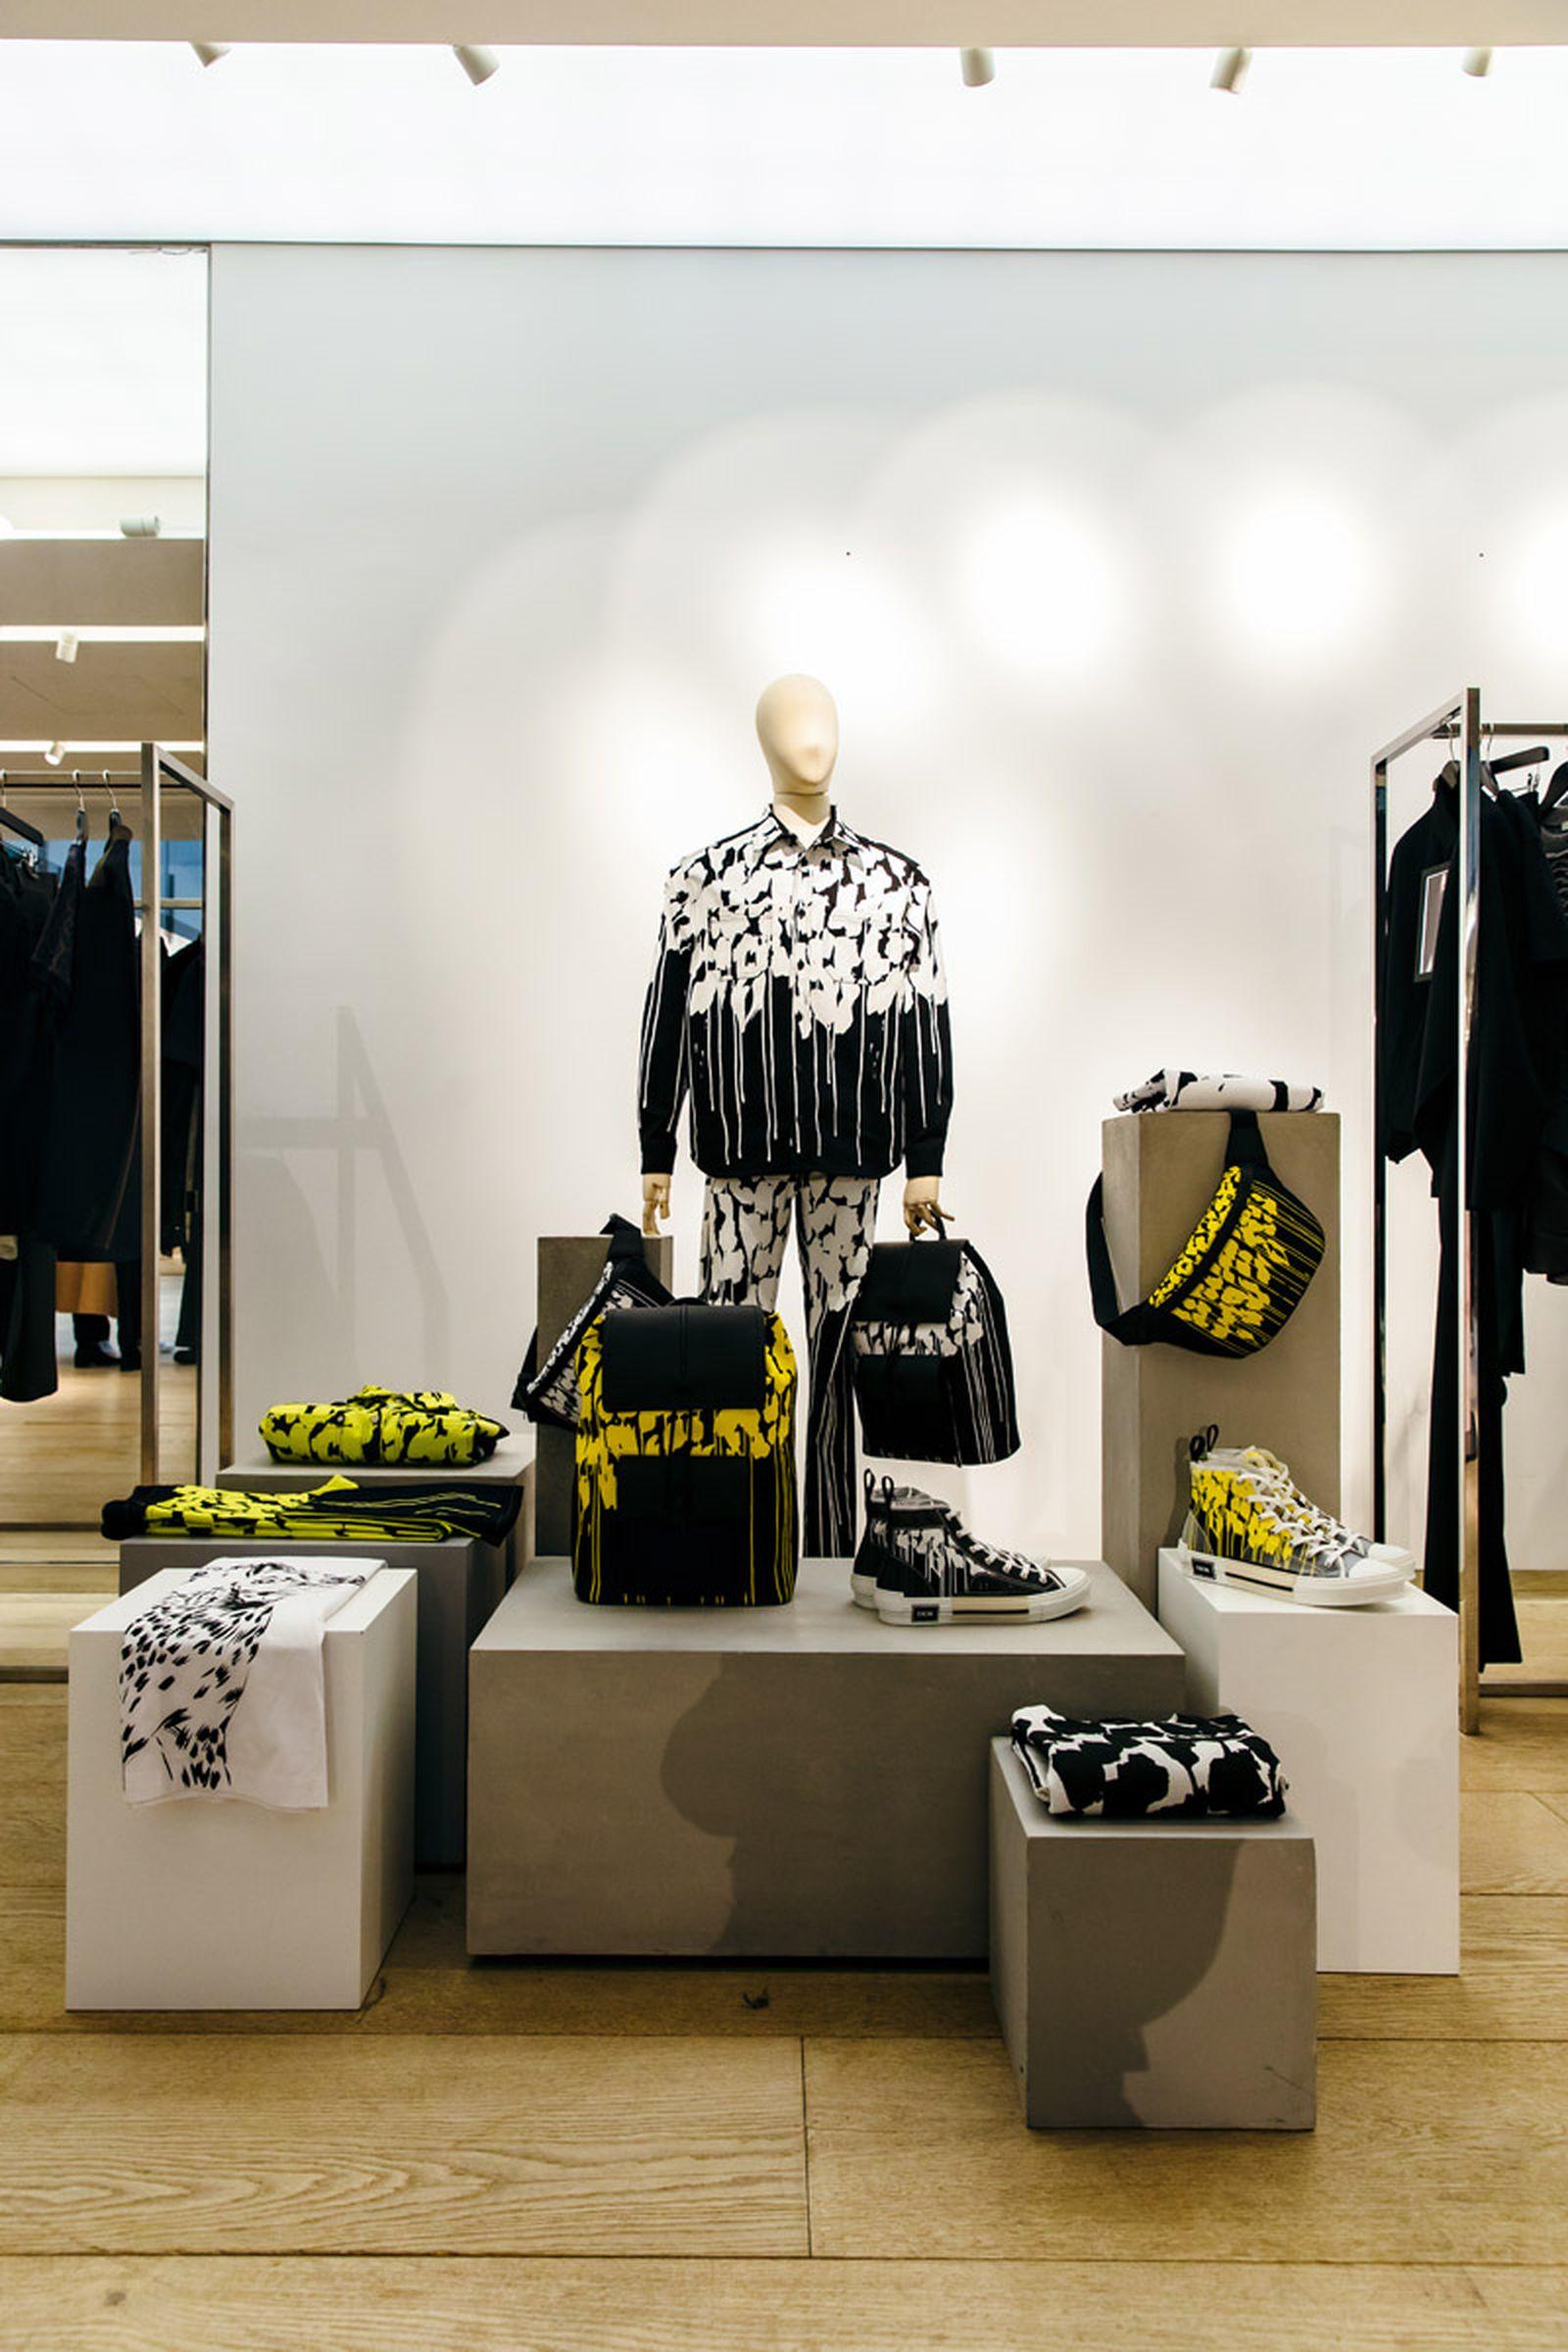 MFW19 Paris Dior ReSees Clothes JulienTell 03 kim jones pfw